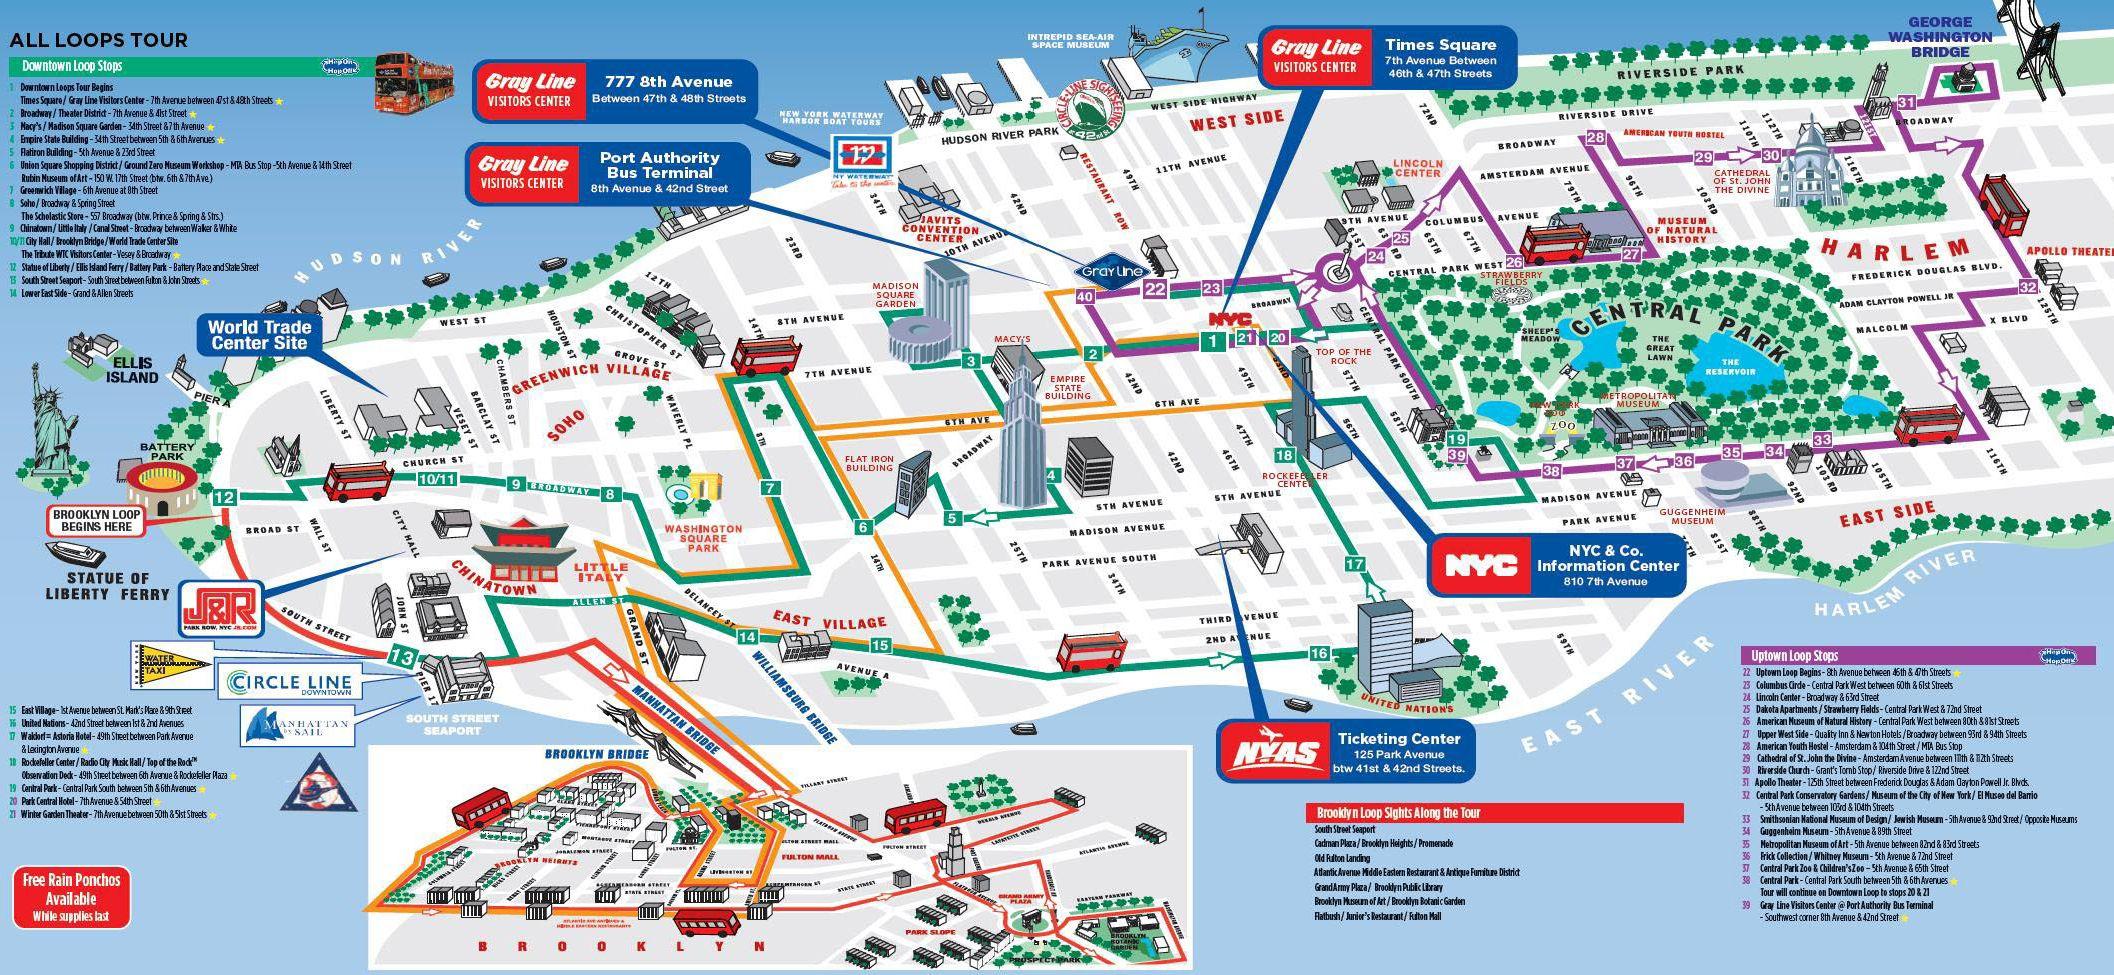 Hop On Hop Off Nyc Map Hop on hop off NY map | New york attractions, New york city map